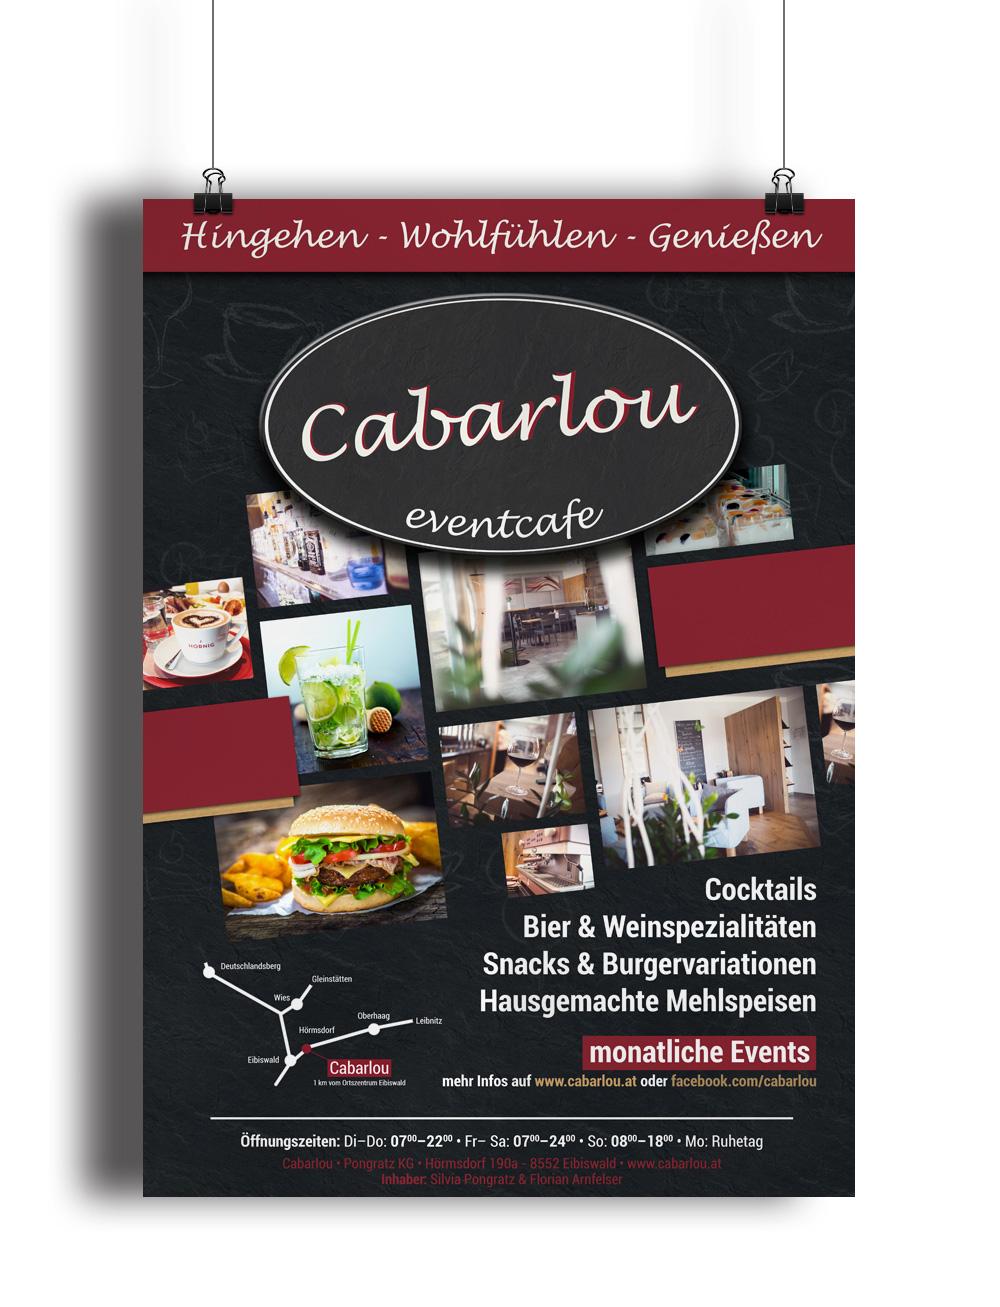 Werbung, Eventcafe Eibiswald